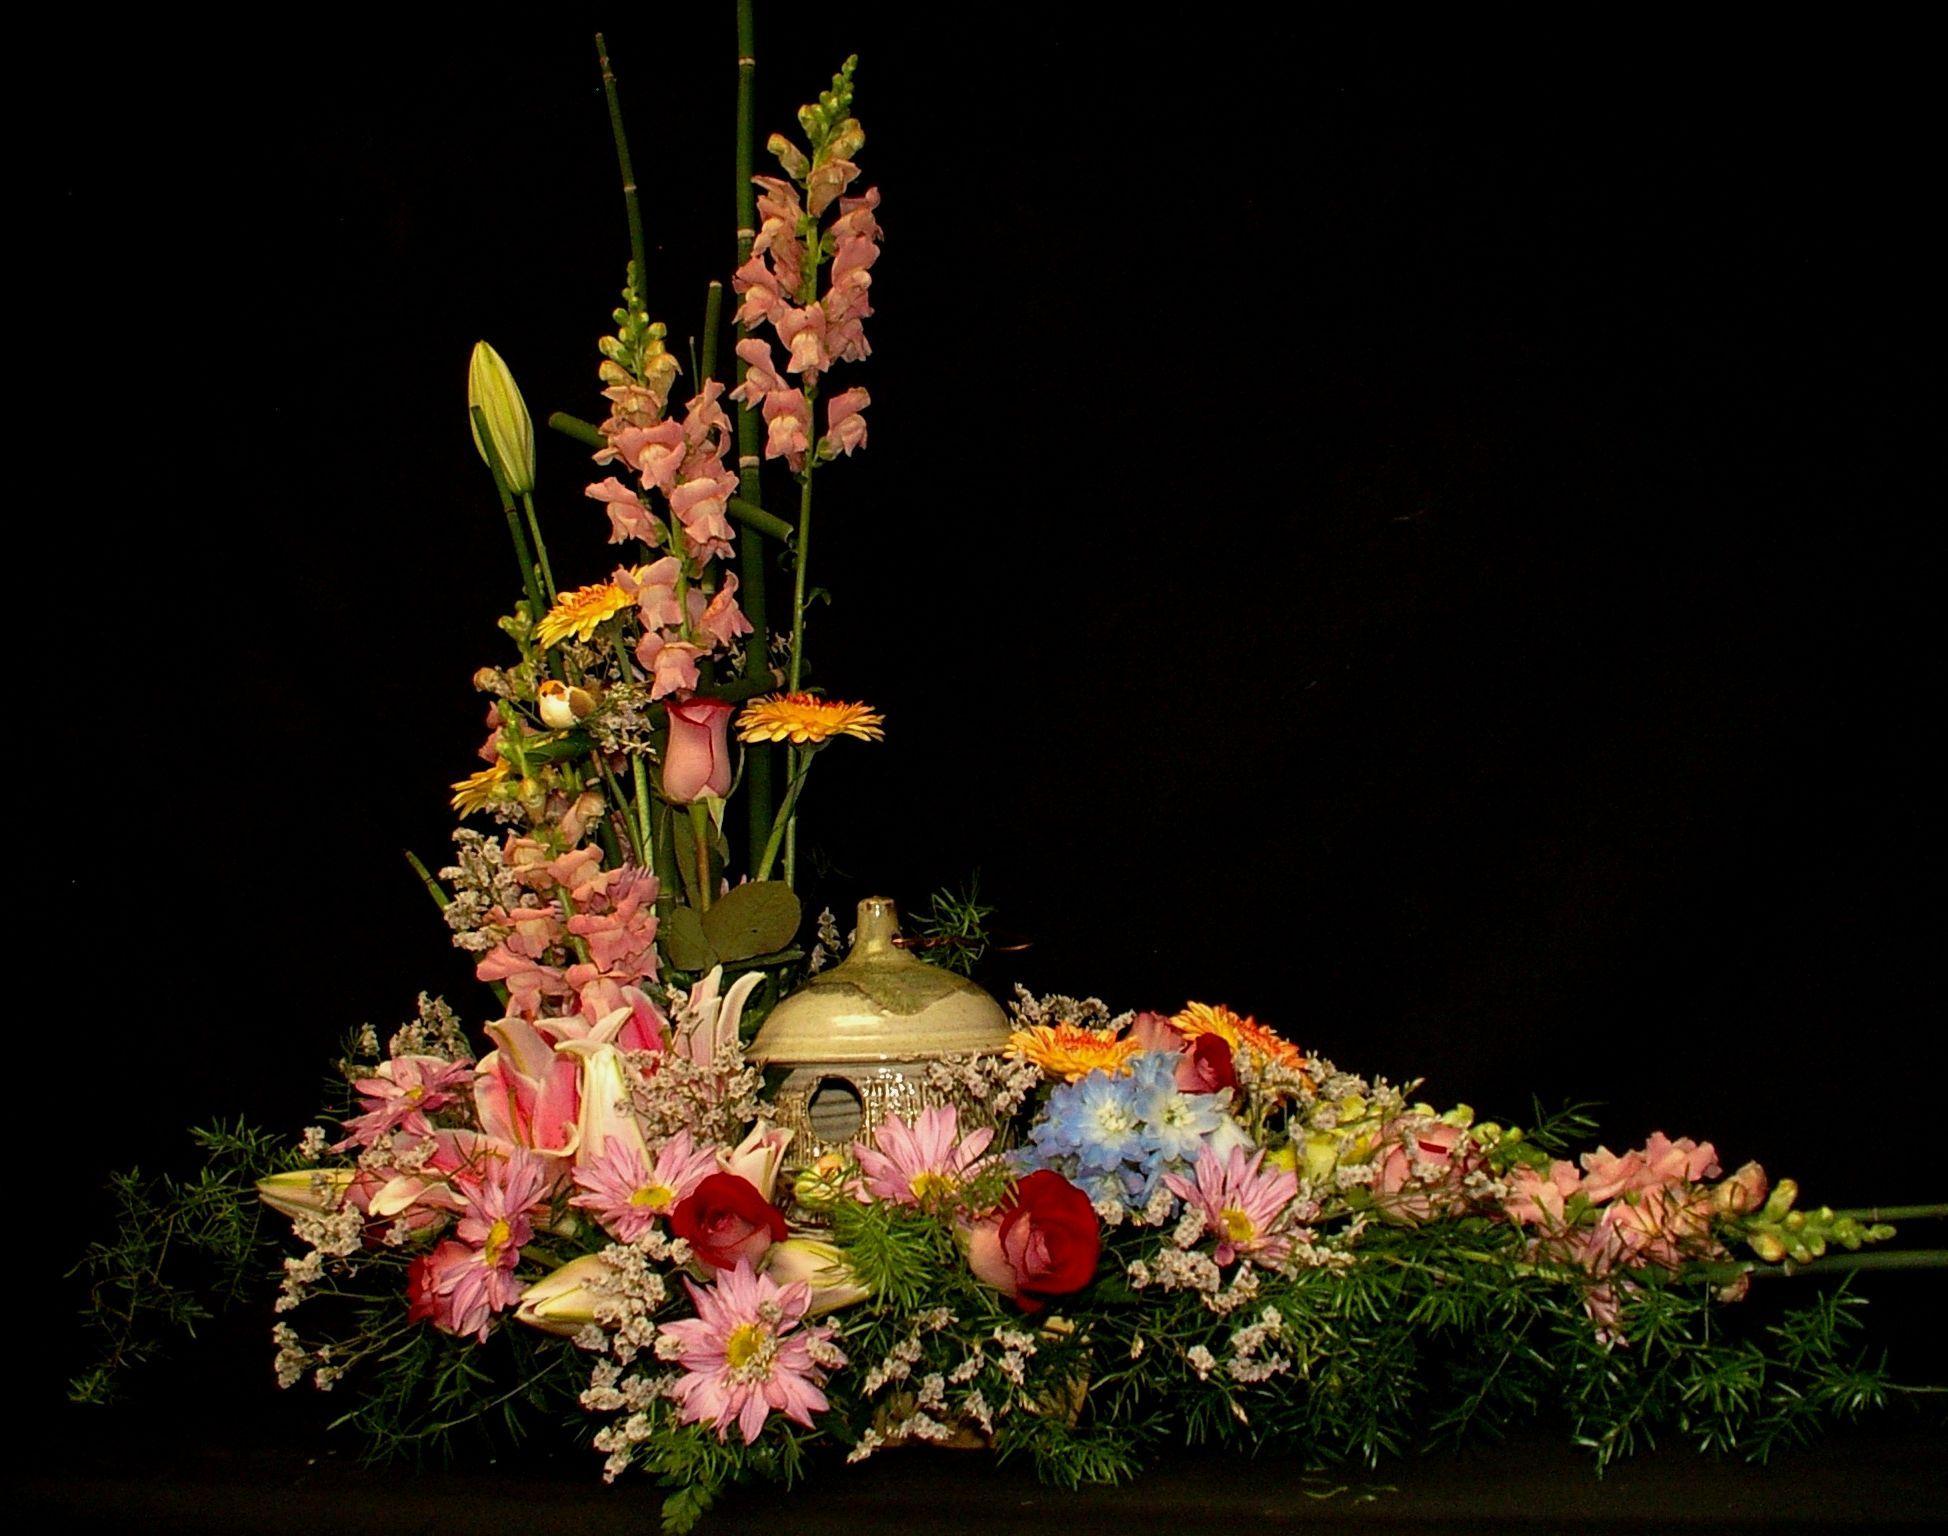 Funeral birdhouse lg 19481536 urn floral arrangements floral arrangement funeral birdhouse lg 19481536 dhlflorist Gallery